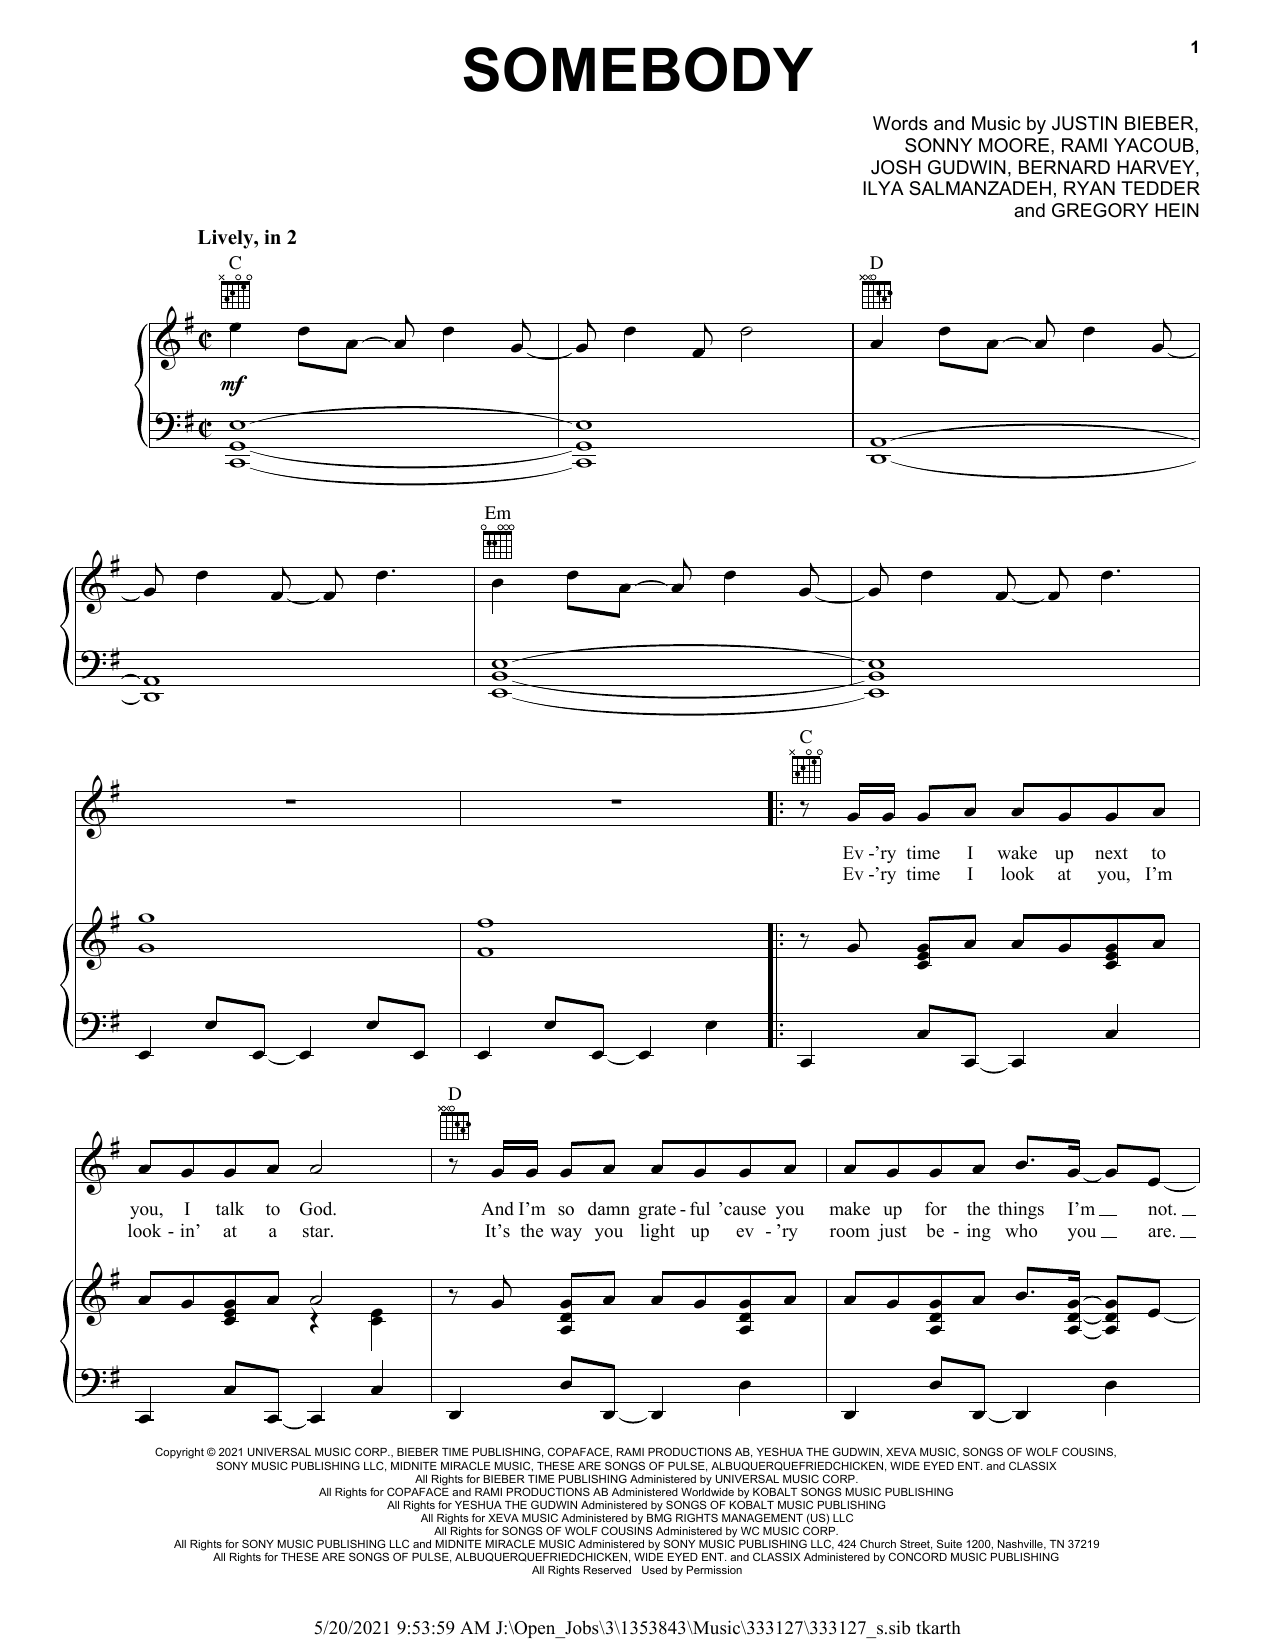 Justin Bieber Somebody sheet music notes and chords. Download Printable PDF.